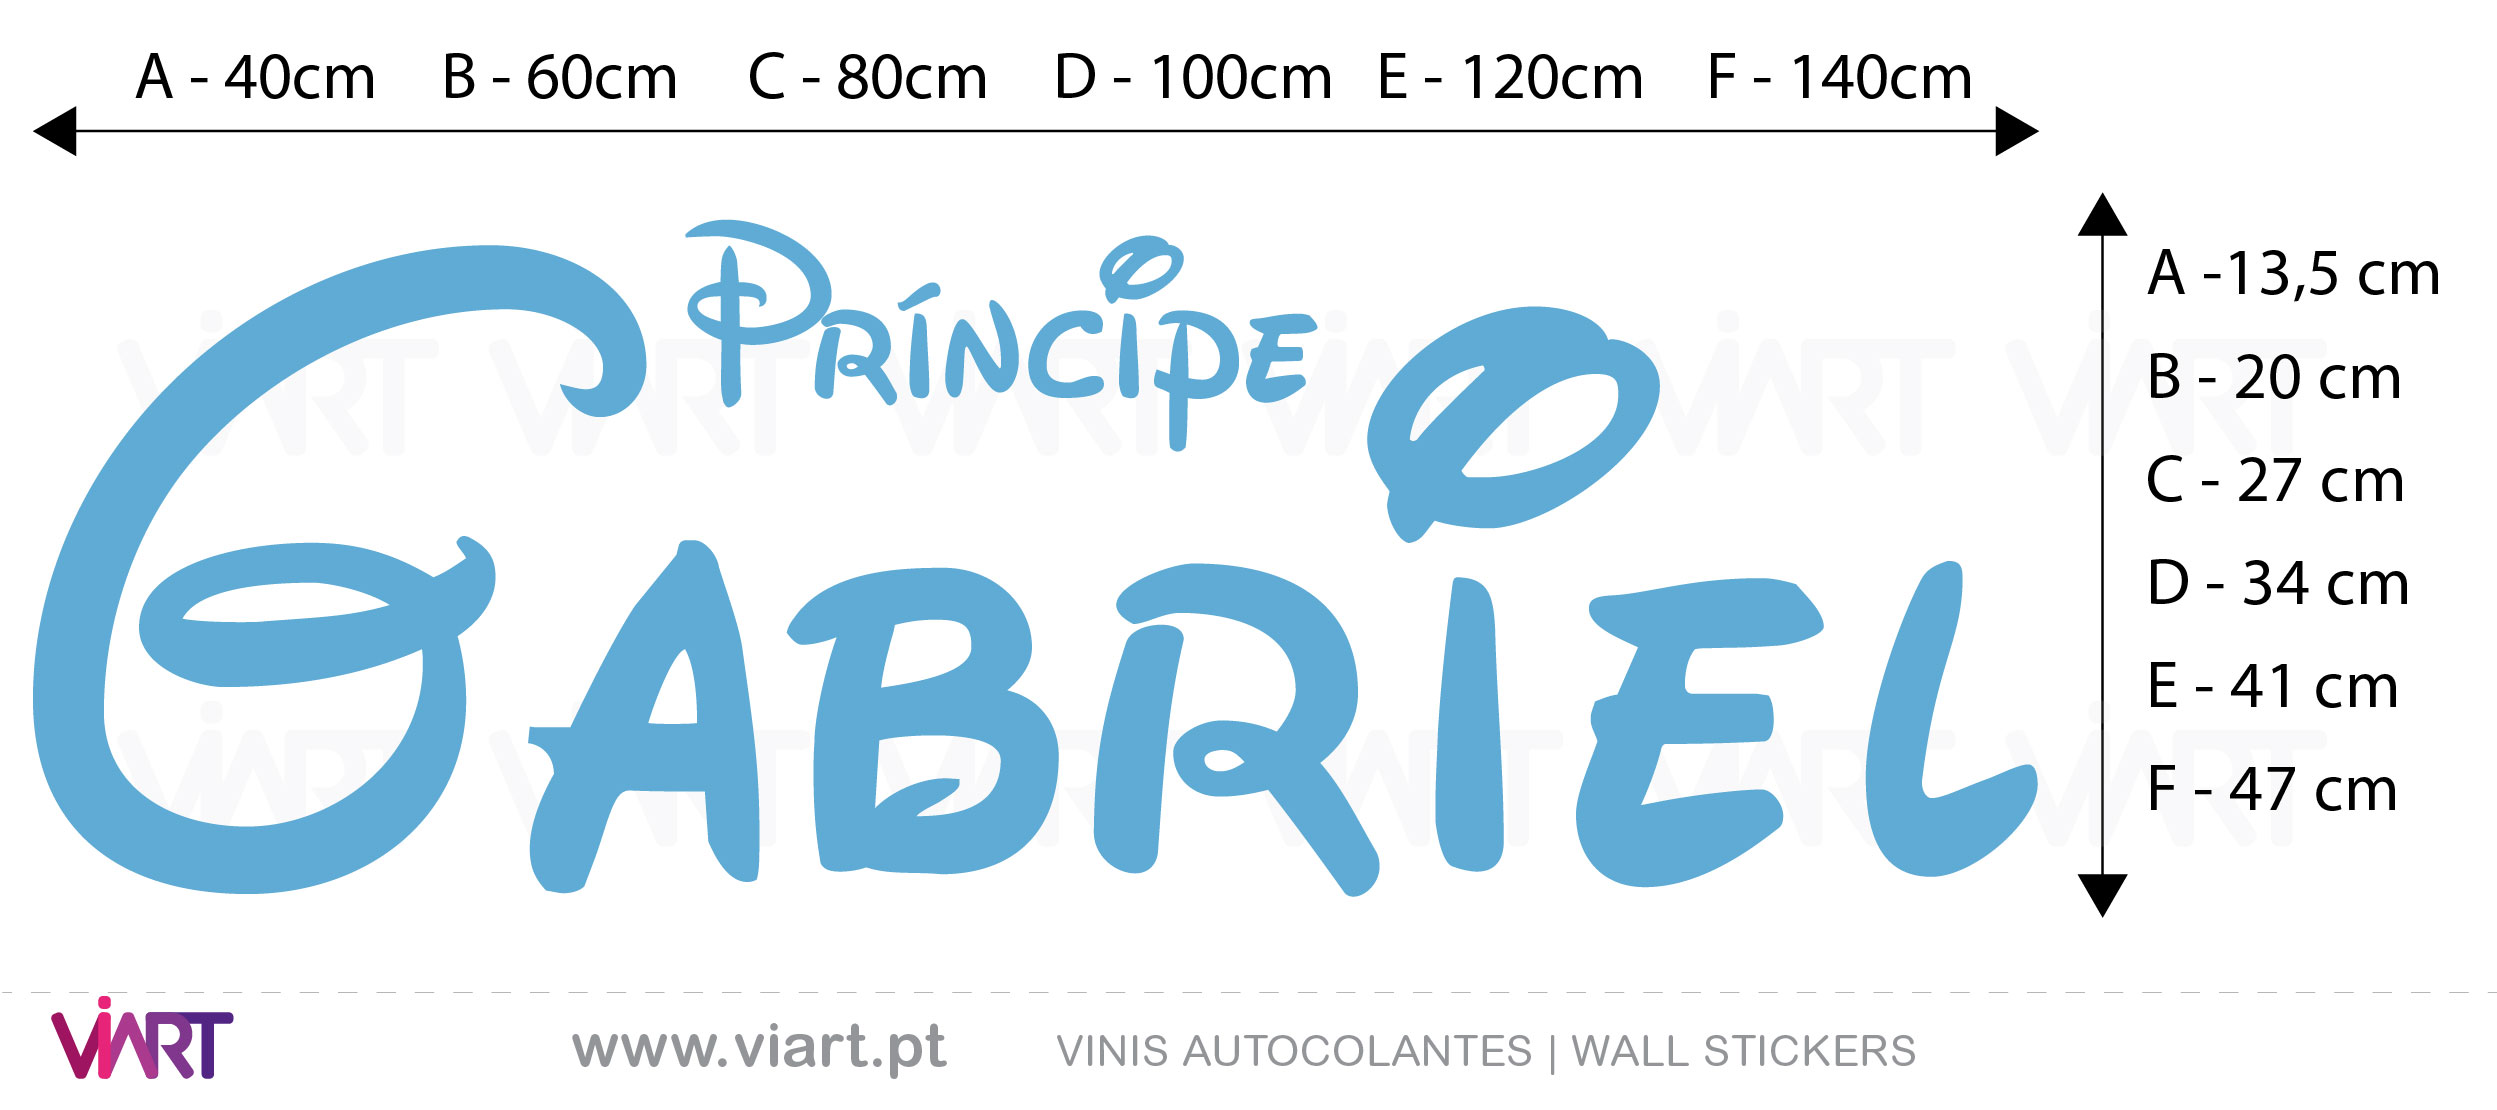 Viart Wall Stickers - Customizable Prince Name- measures